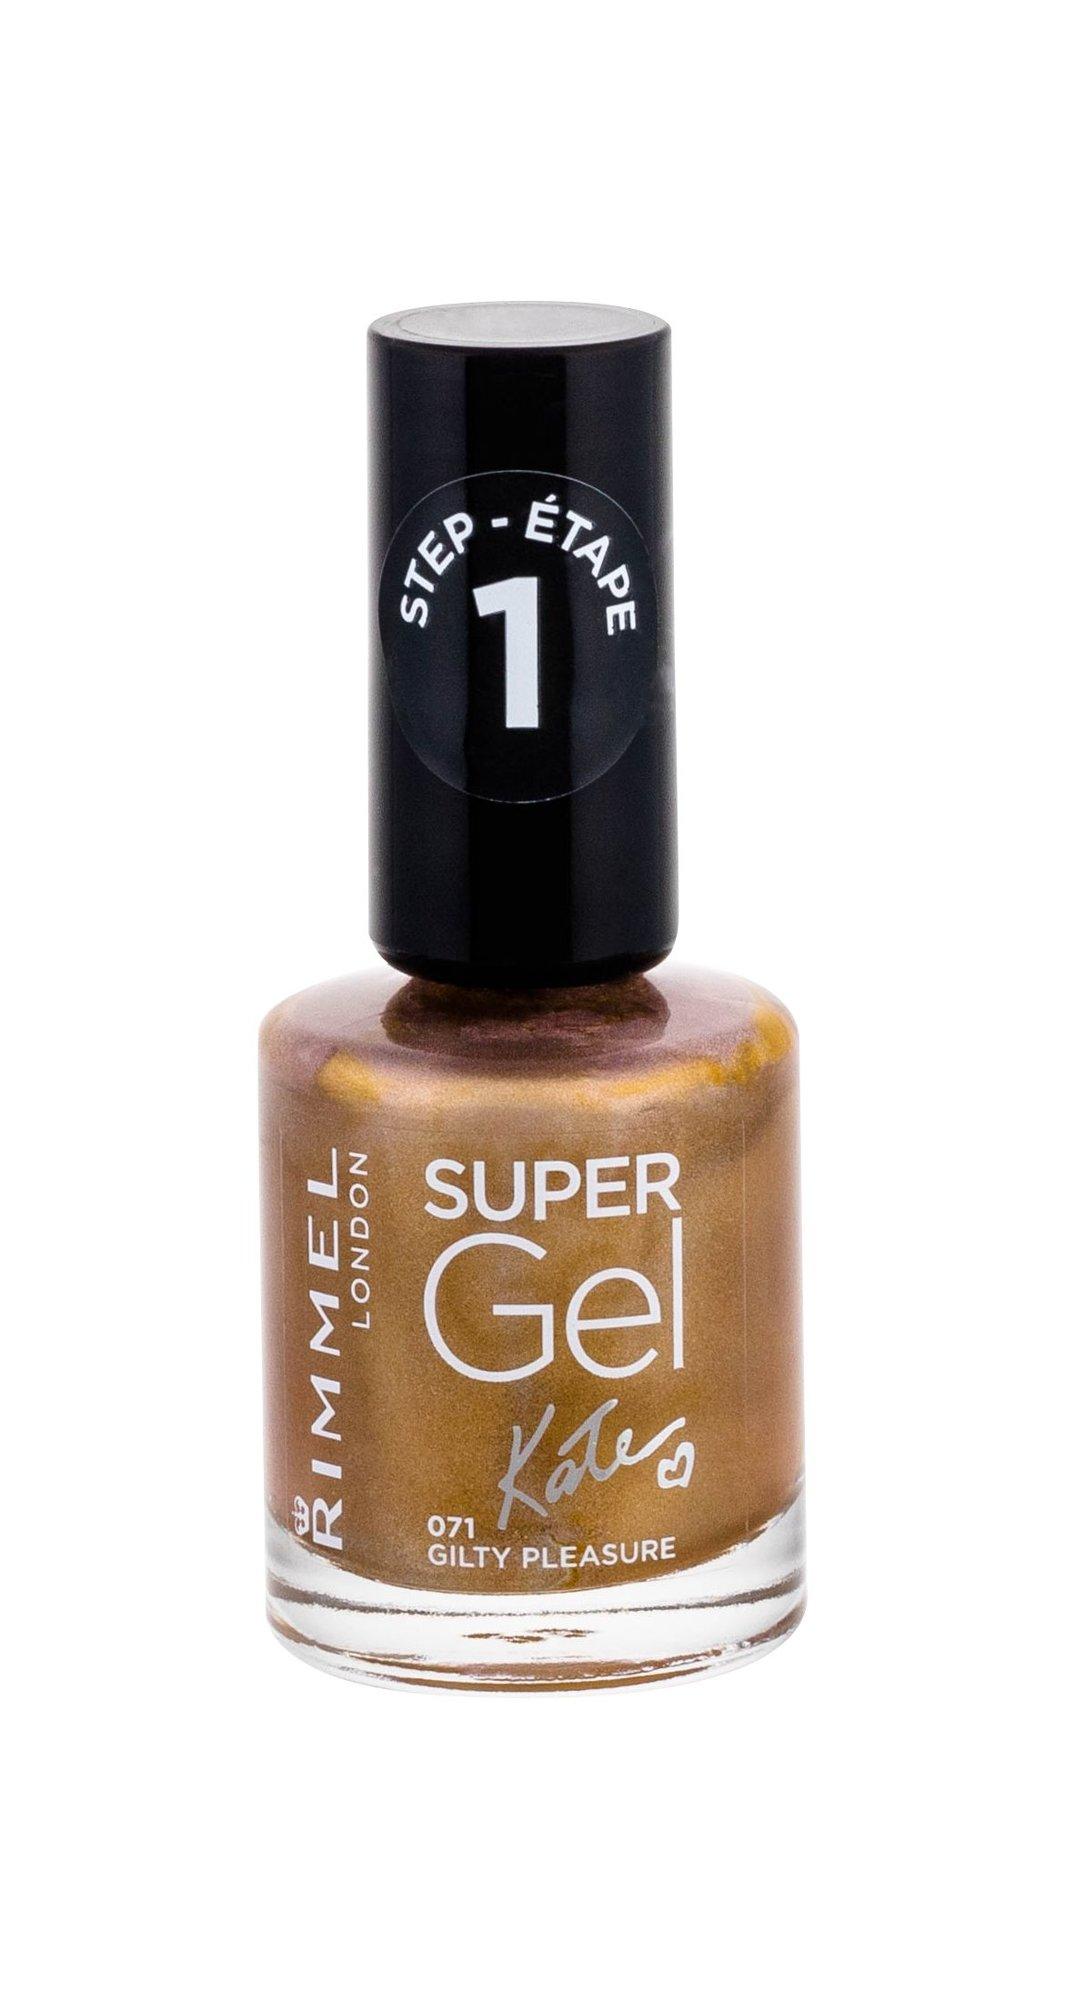 Rimmel London Super Gel By Kate Cosmetic 12ml 071 Guilty Pleasure